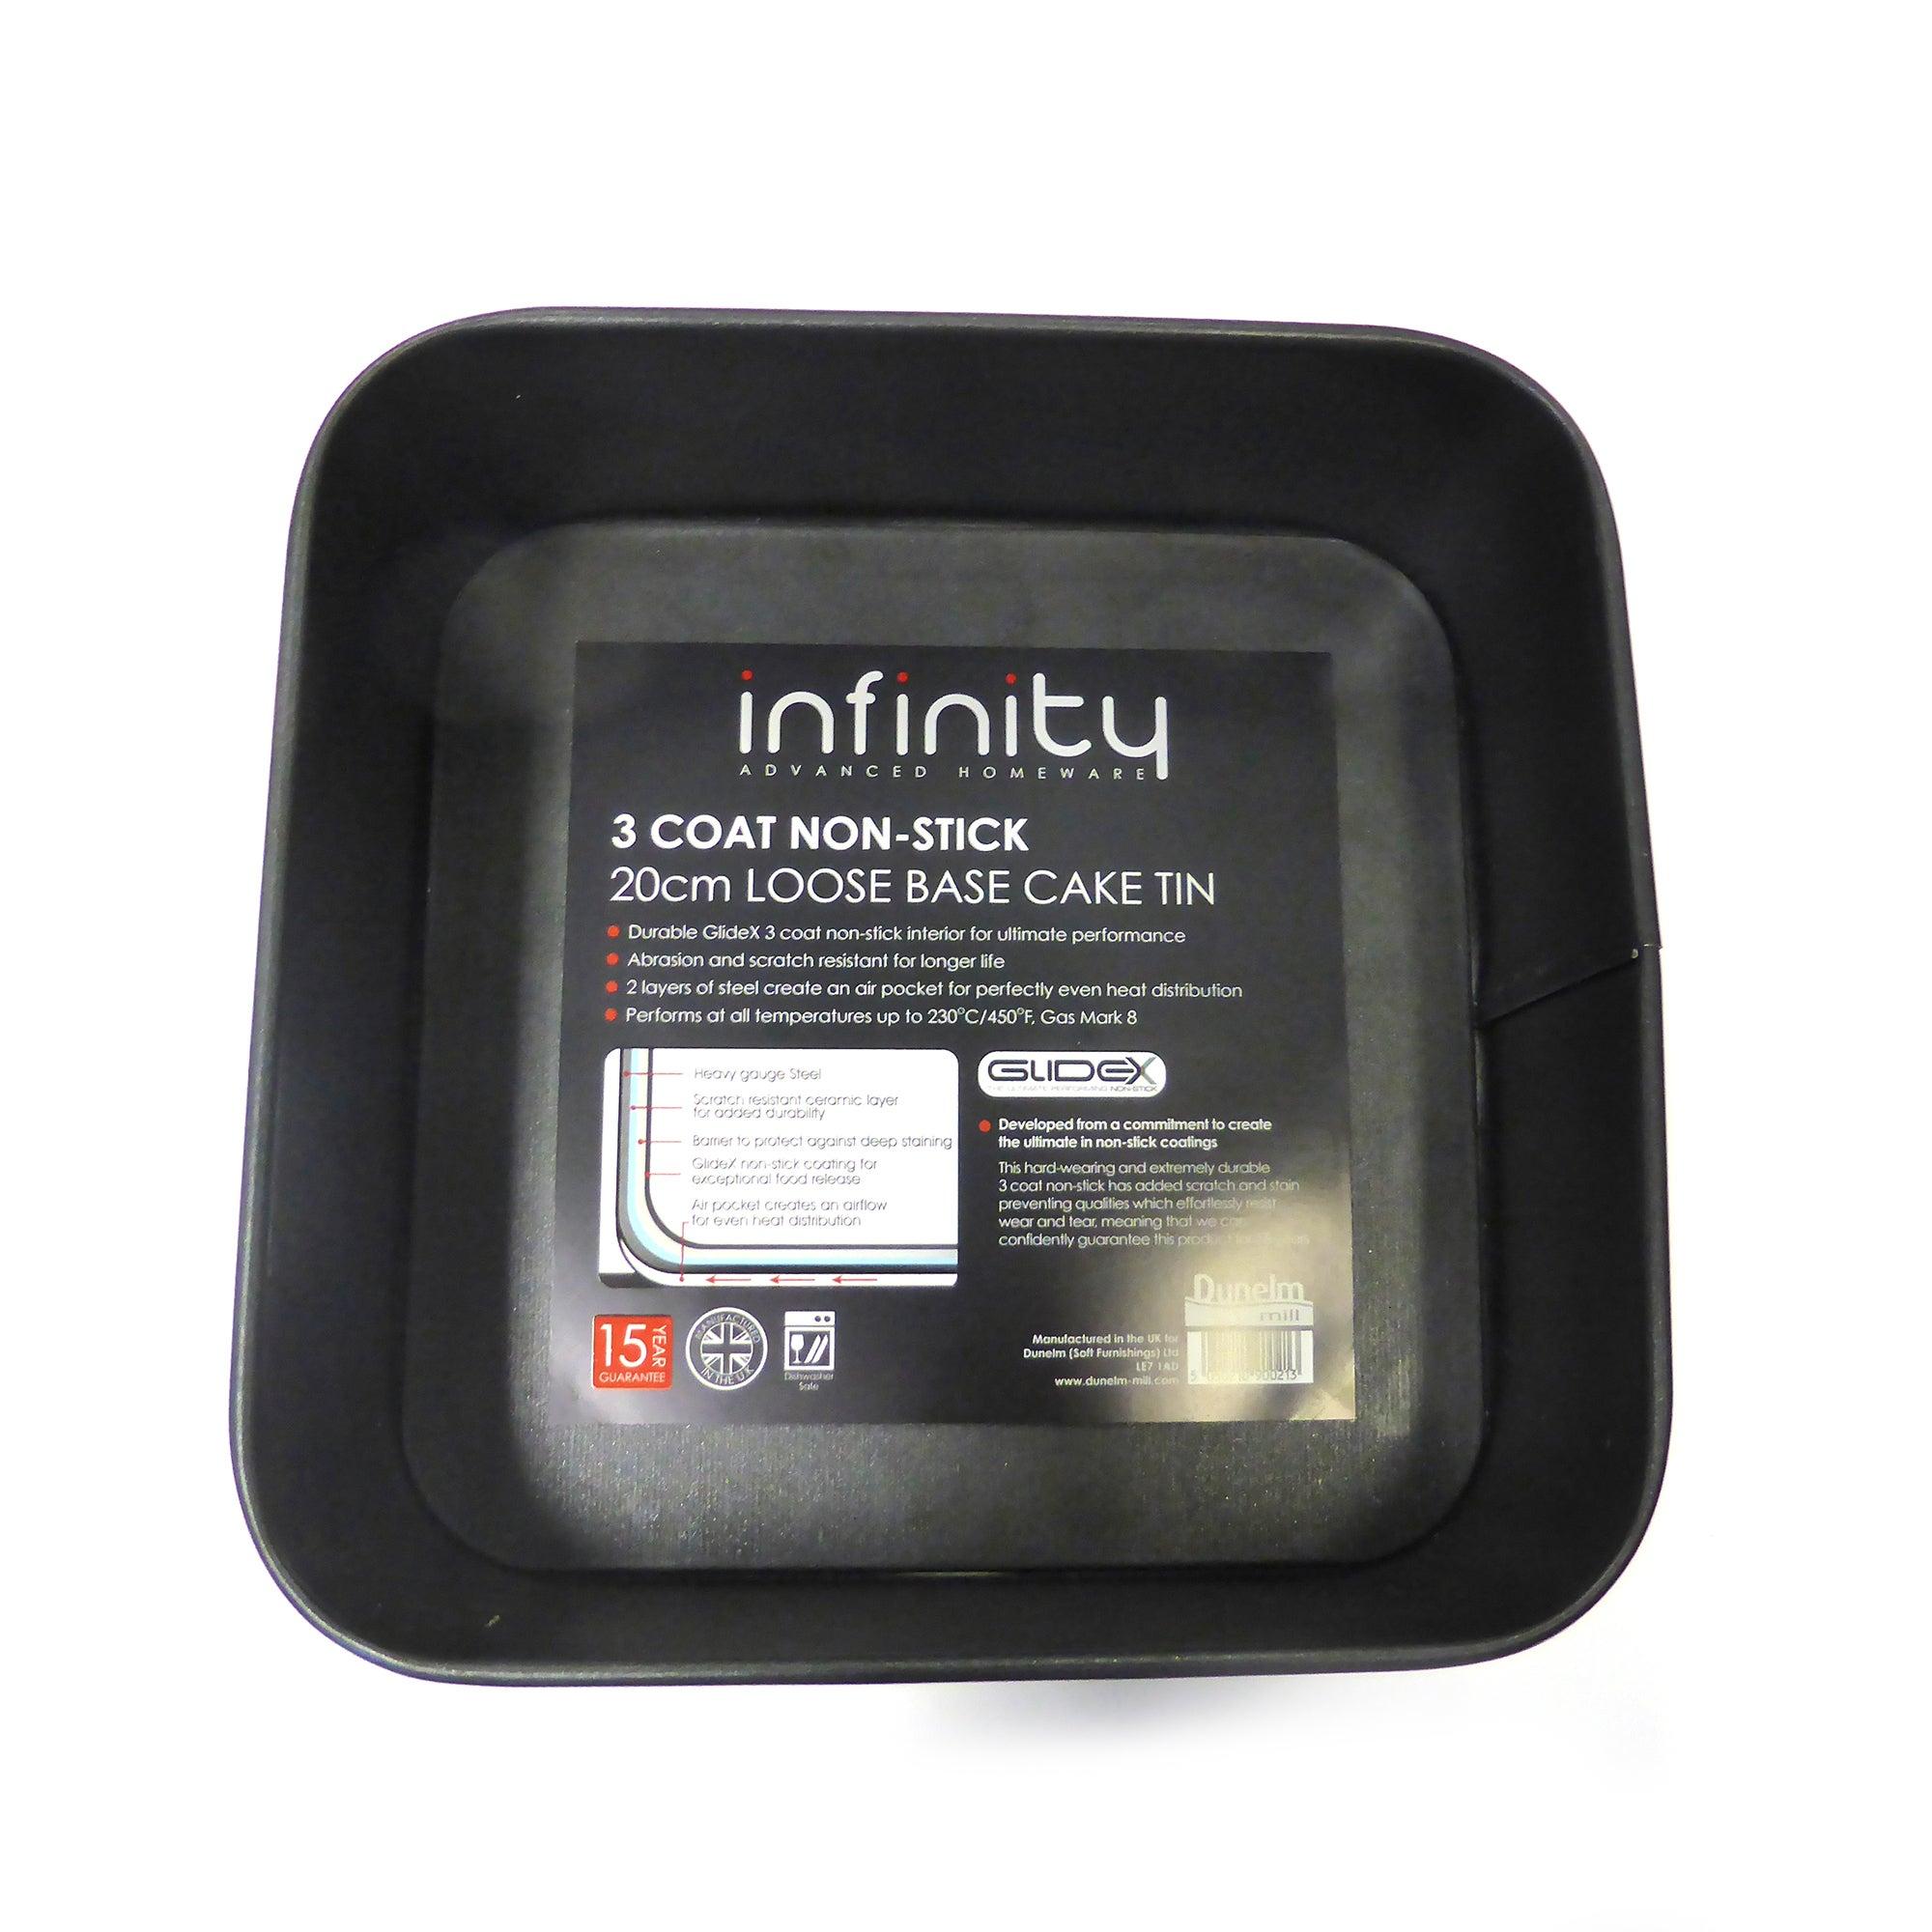 Infinity Glidex Deep Square Tin